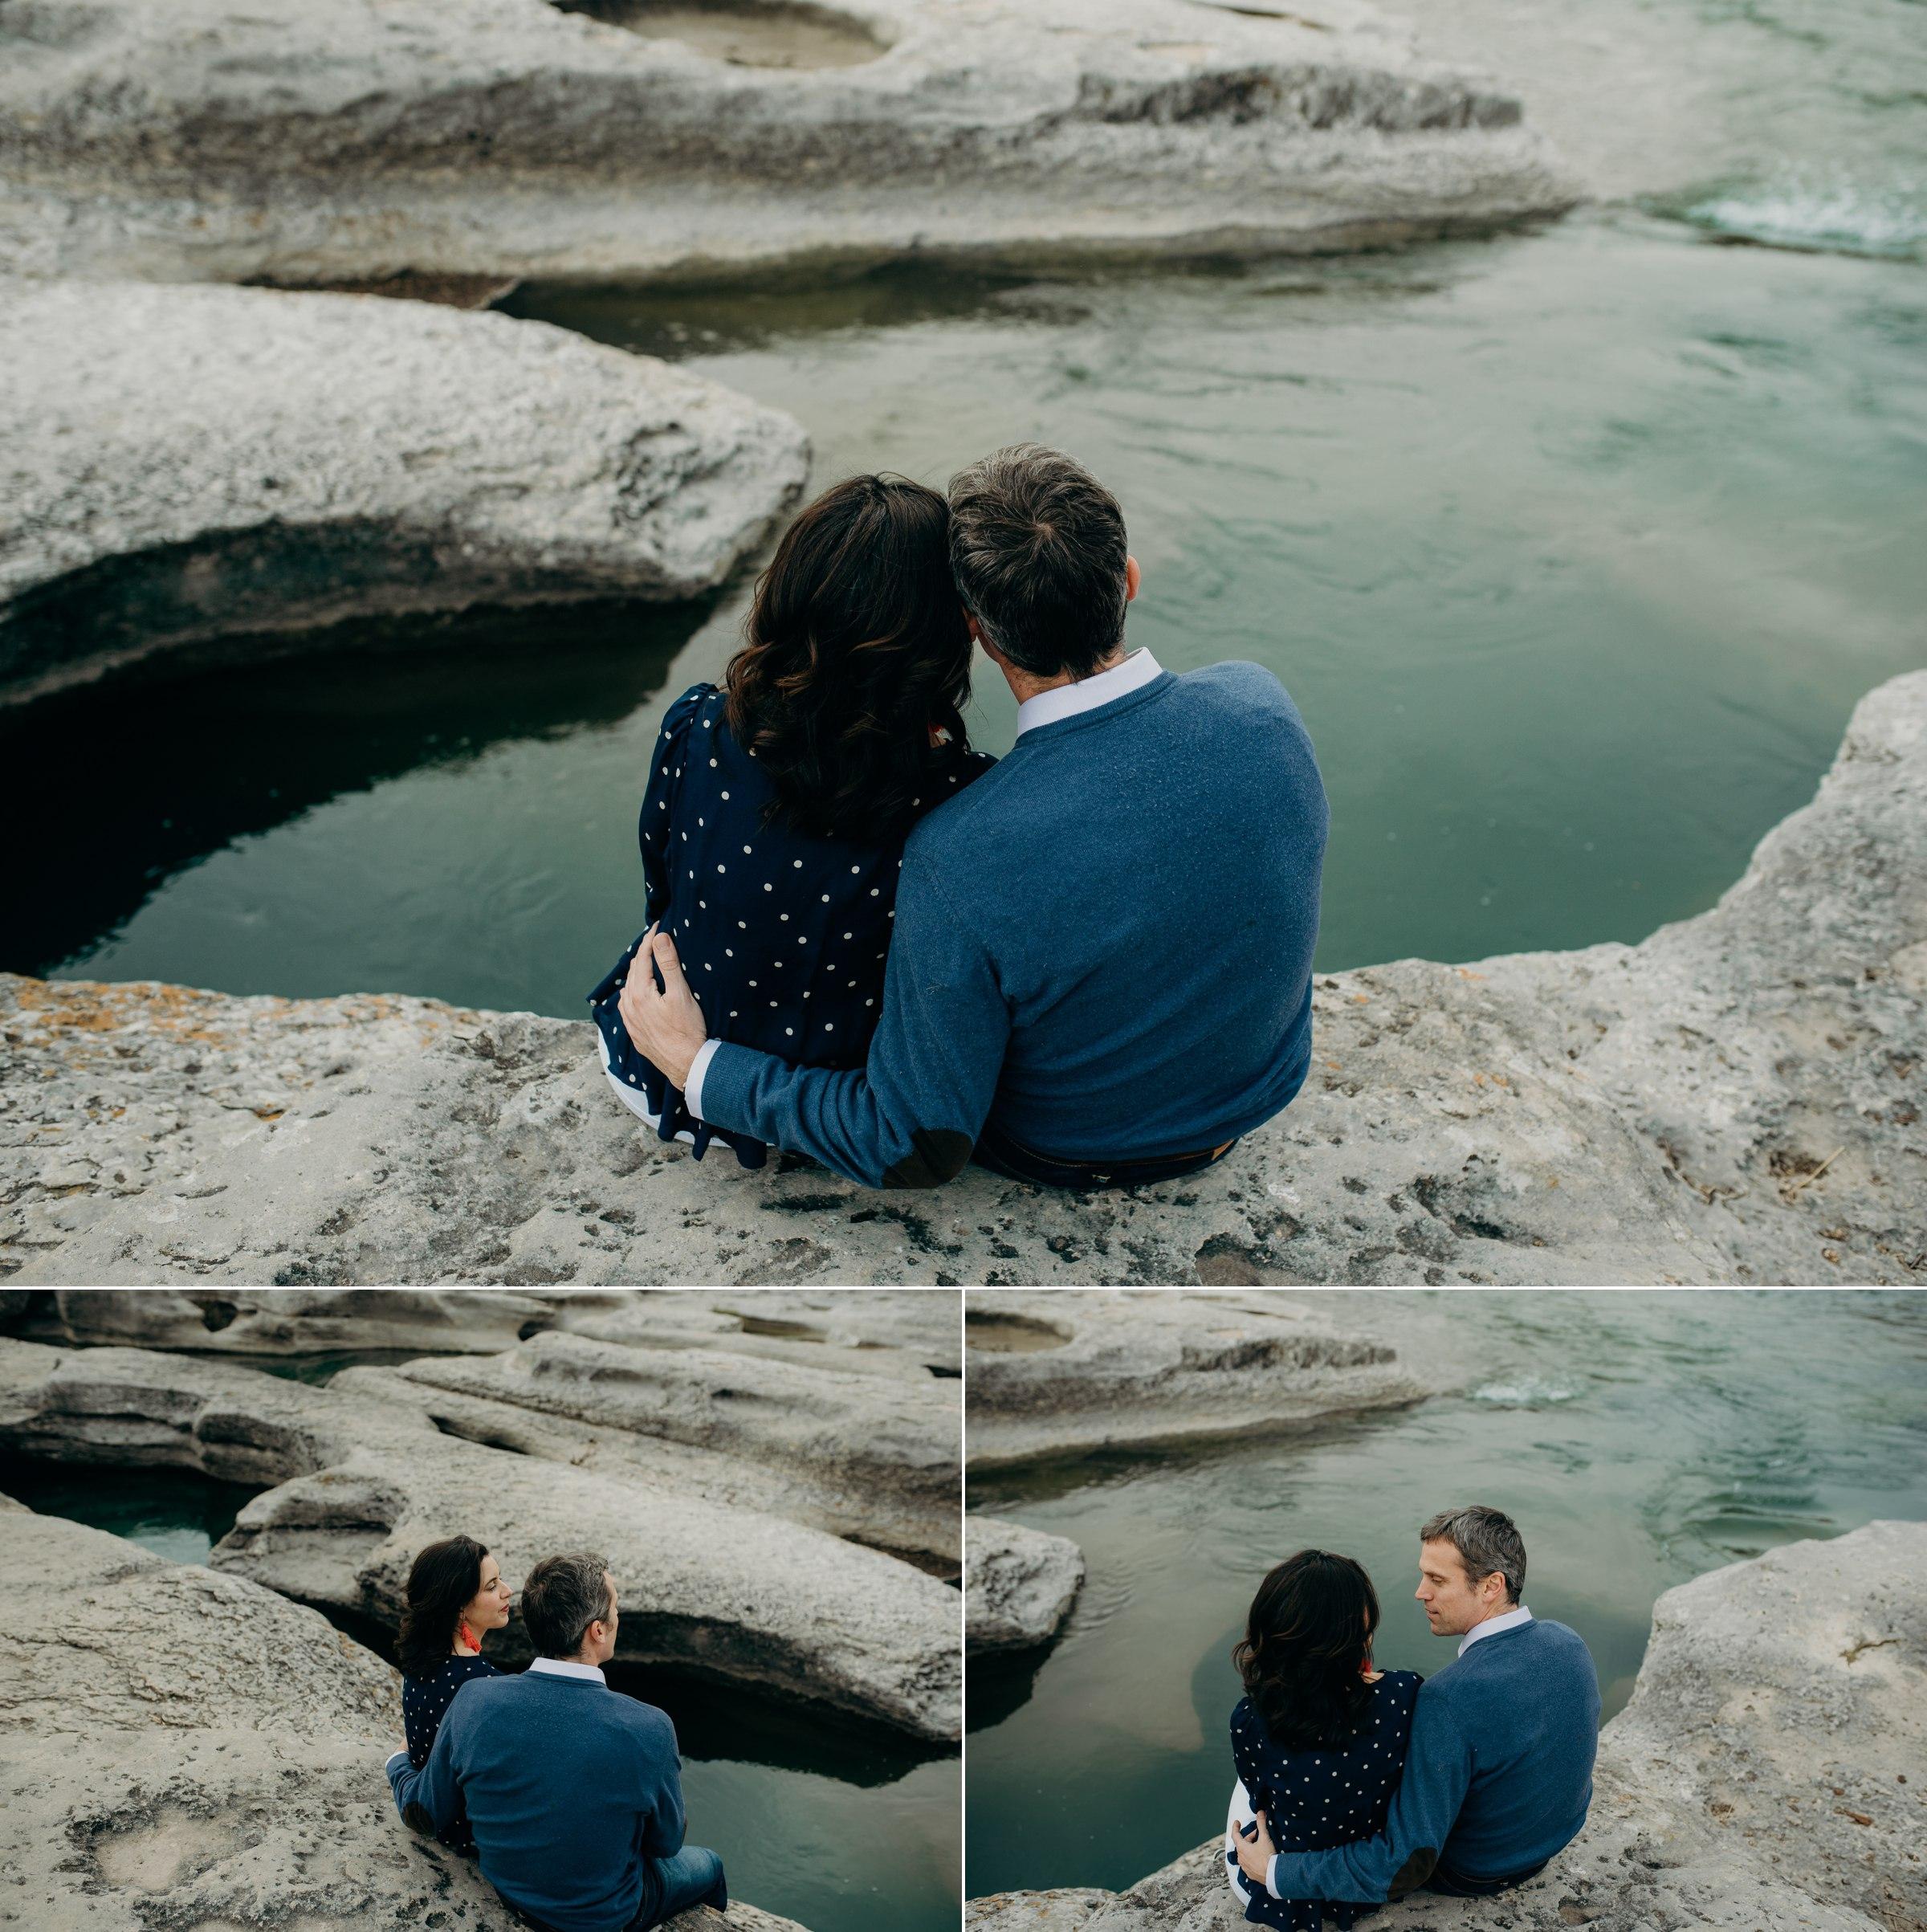 austin-mckinney-falls-engagement-photographer-elopement-prices-best-headshot-senior-adventurous-italy-minneapolis-texas-minnesota-dallas-houston-tulum-mexico_0013.jpg